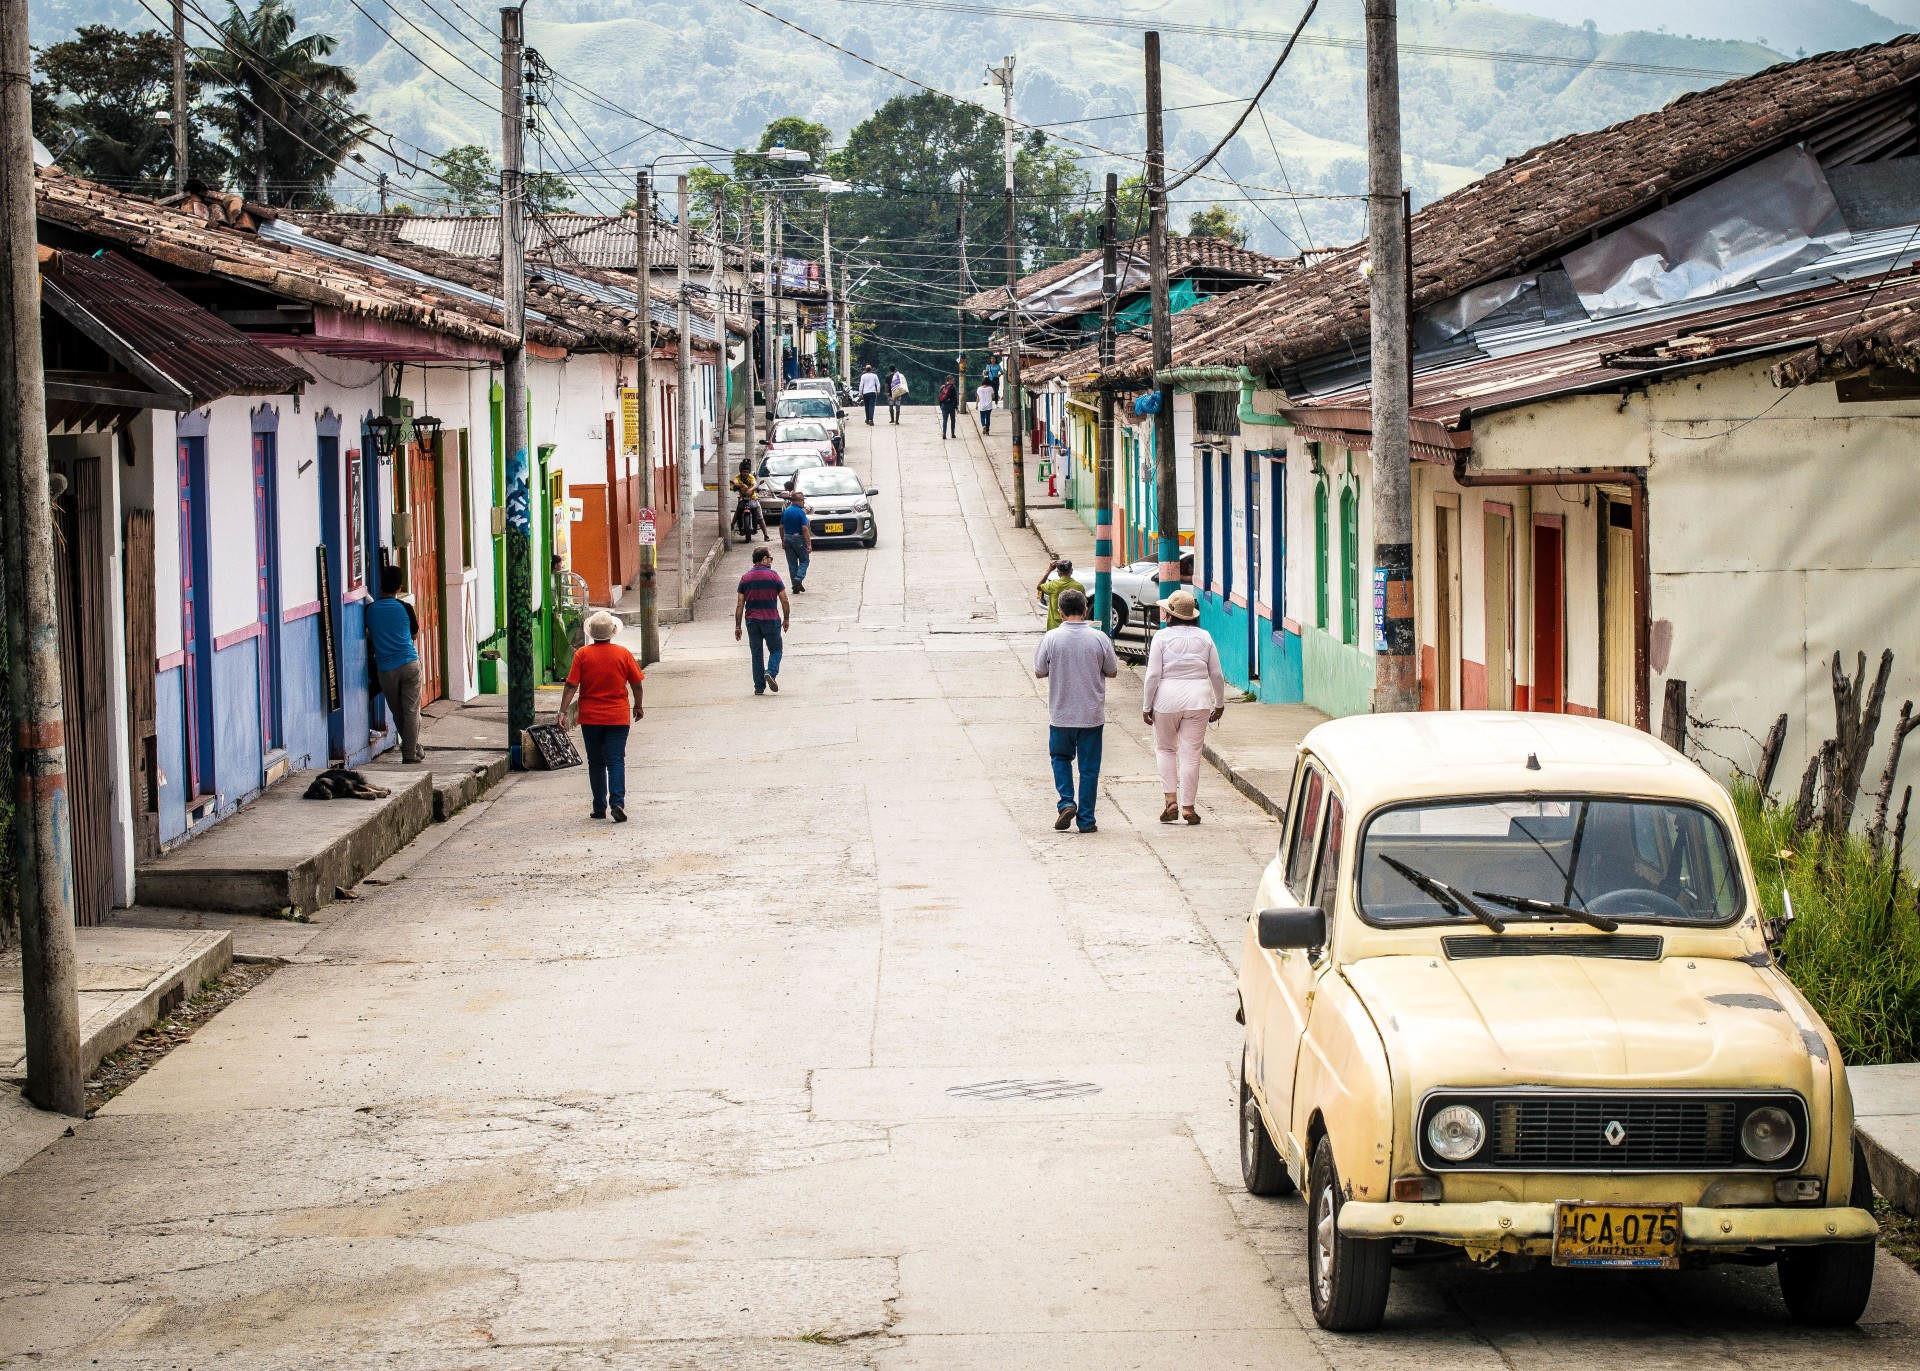 calle de america latina